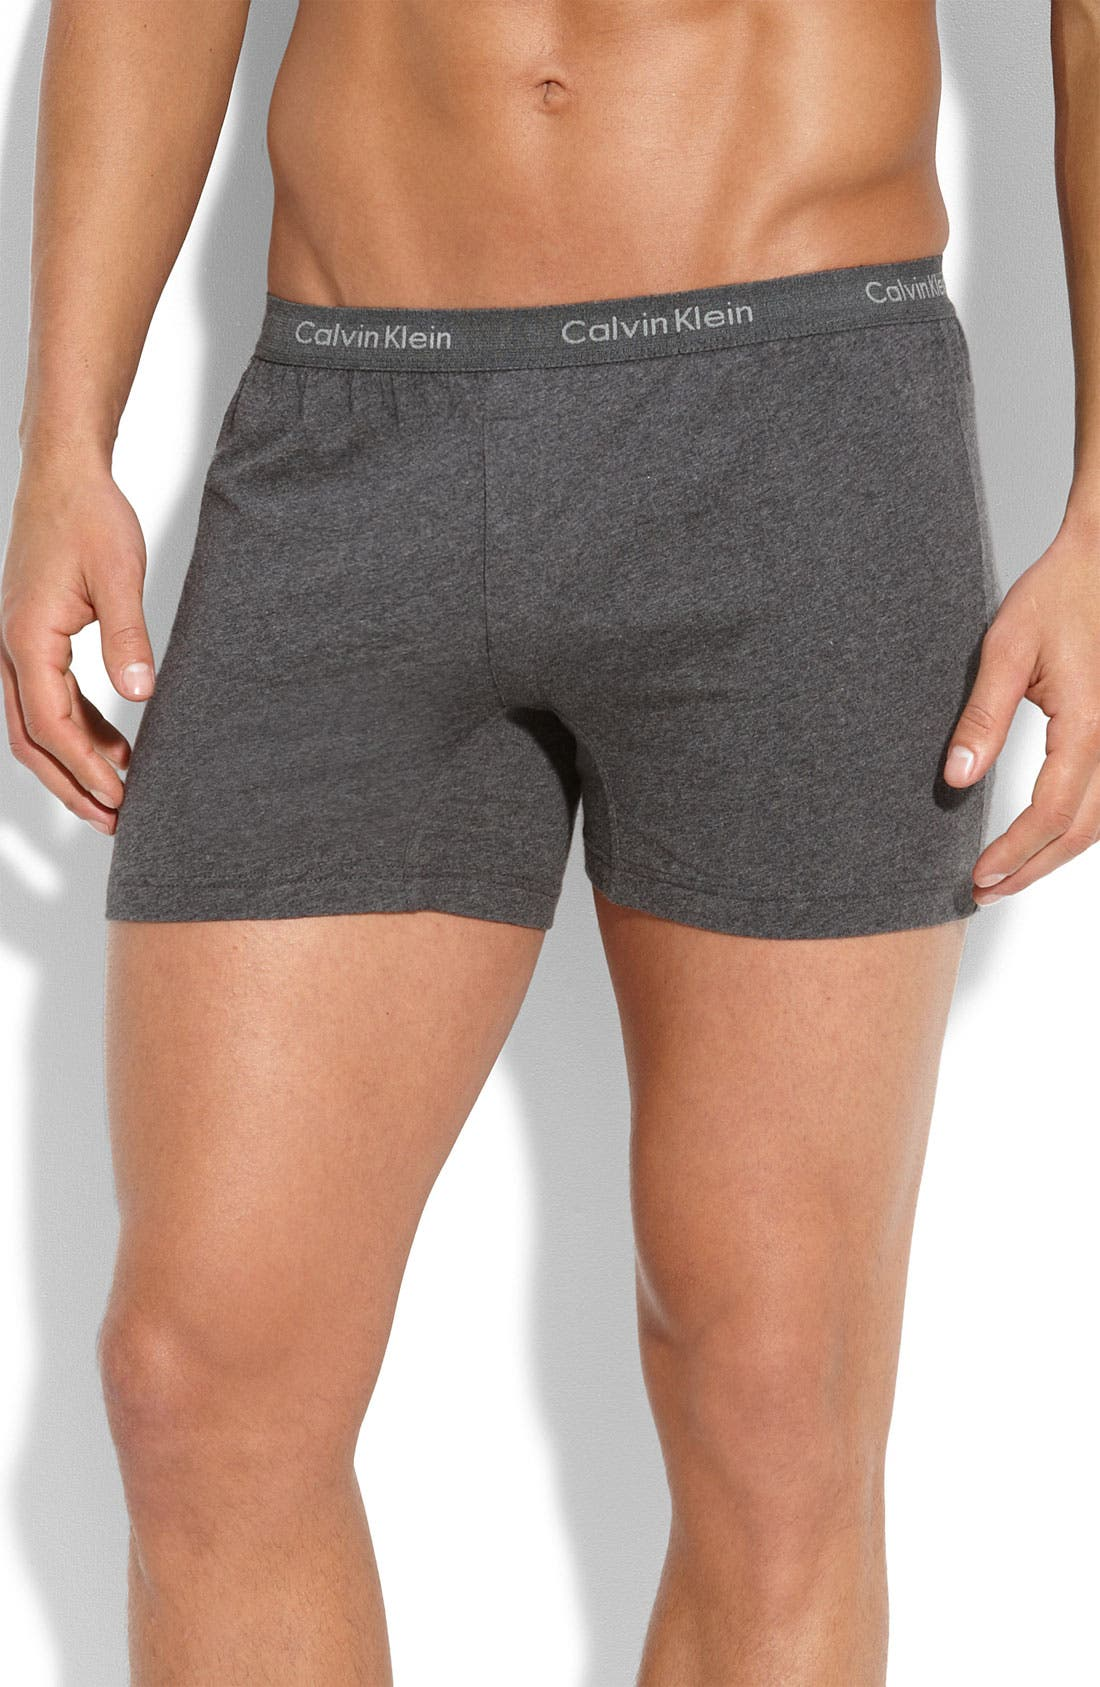 Calvin Klein 'U1029' Slim Fit Boxer Shorts